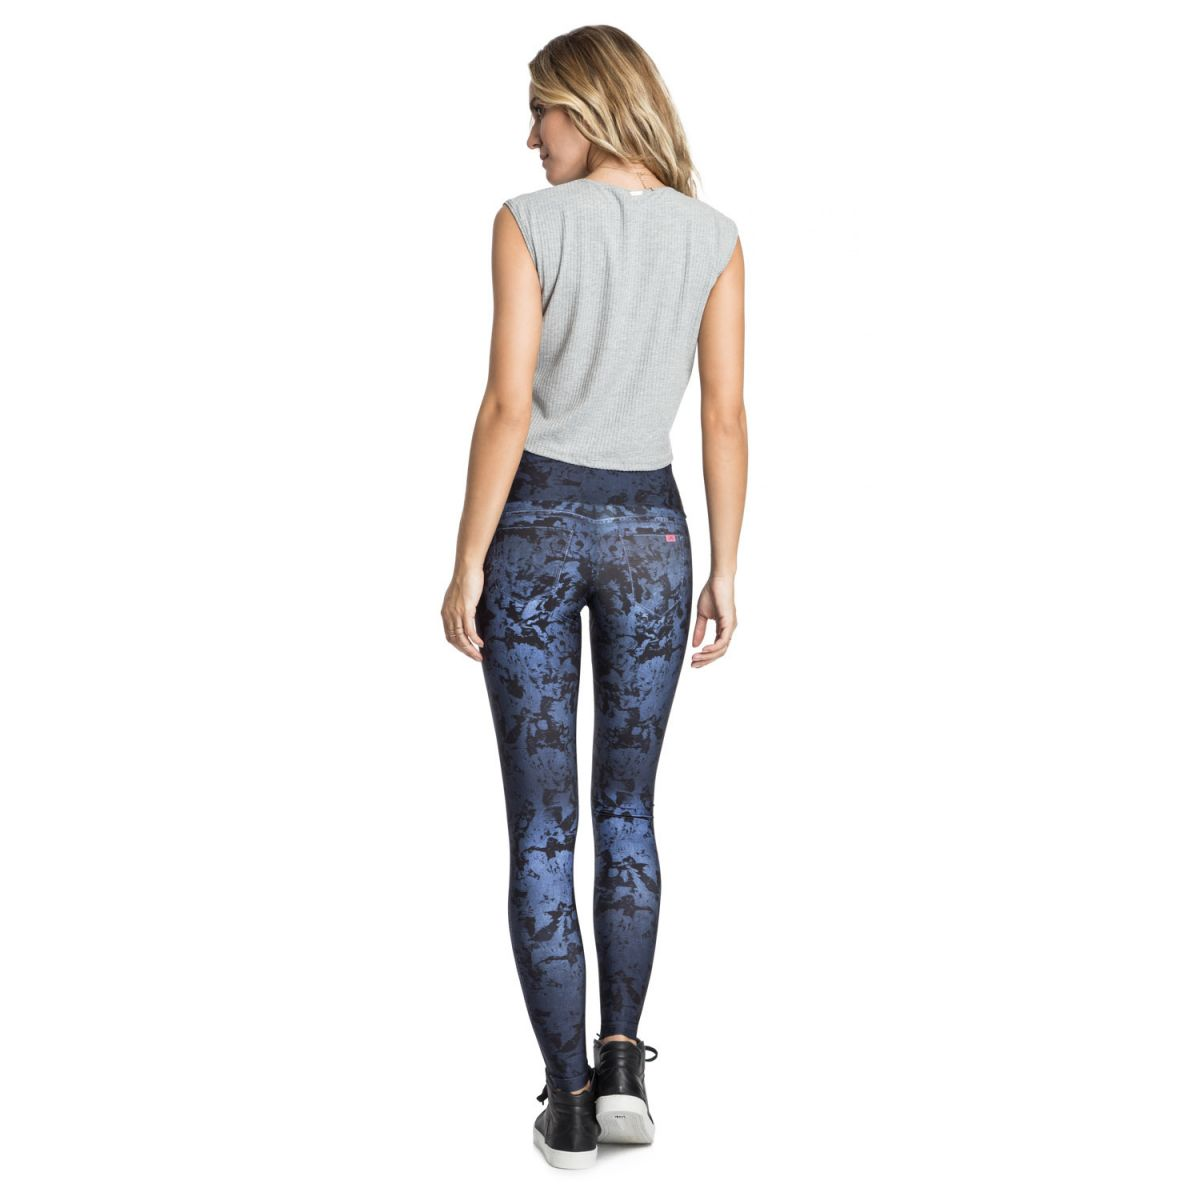 Calça Fusô Jeans Flex Flower Urban Live